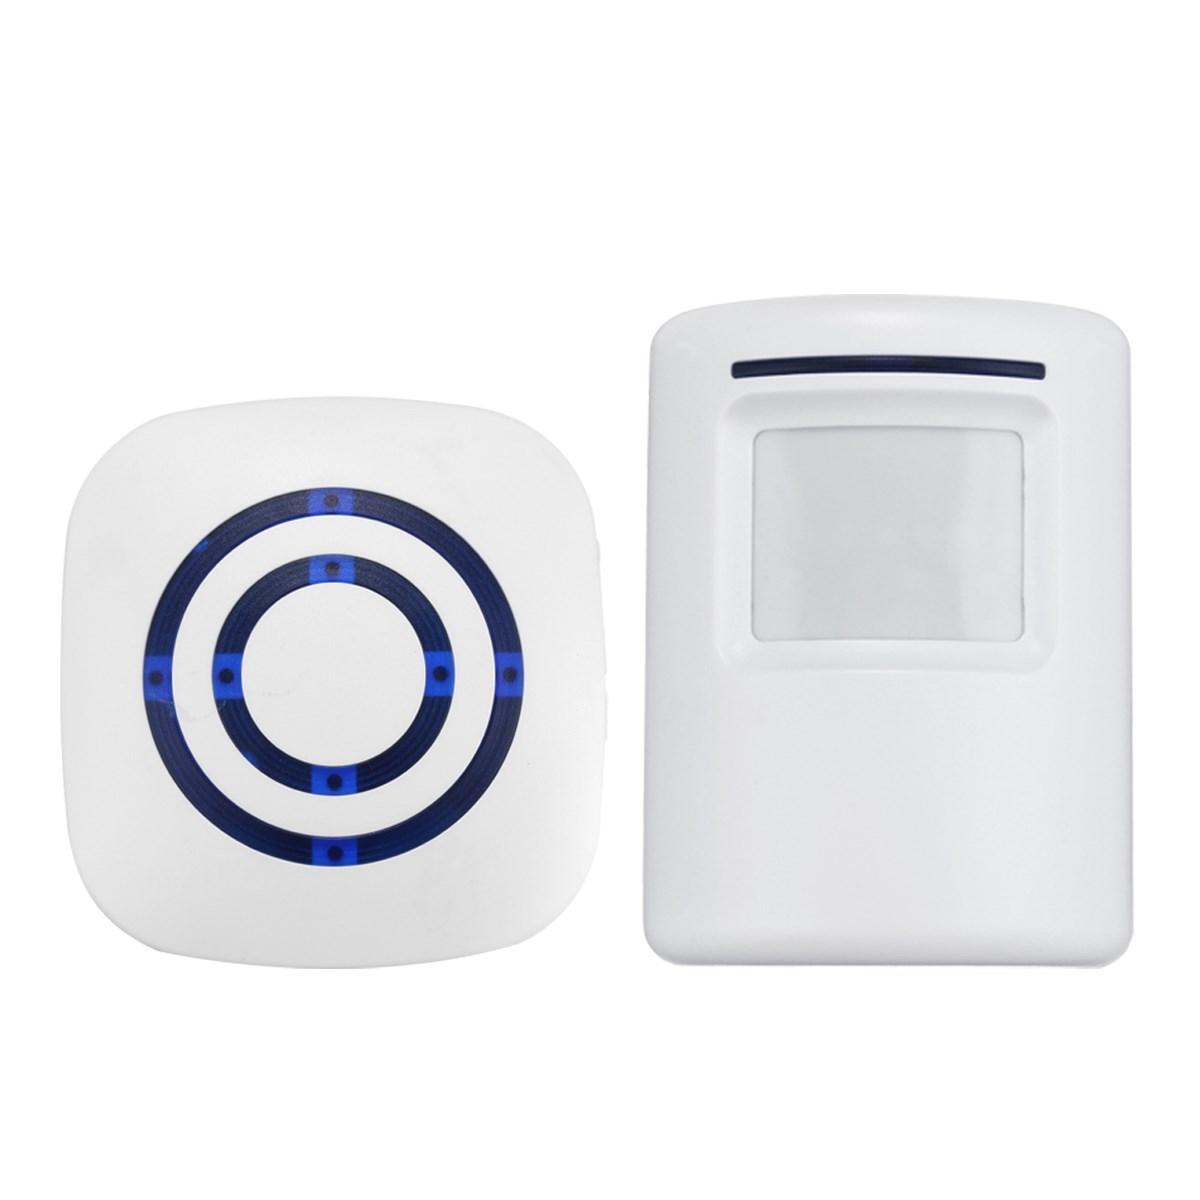 Wholesale Safurance Wireless Motion Sensor Detector Gate Entry Door